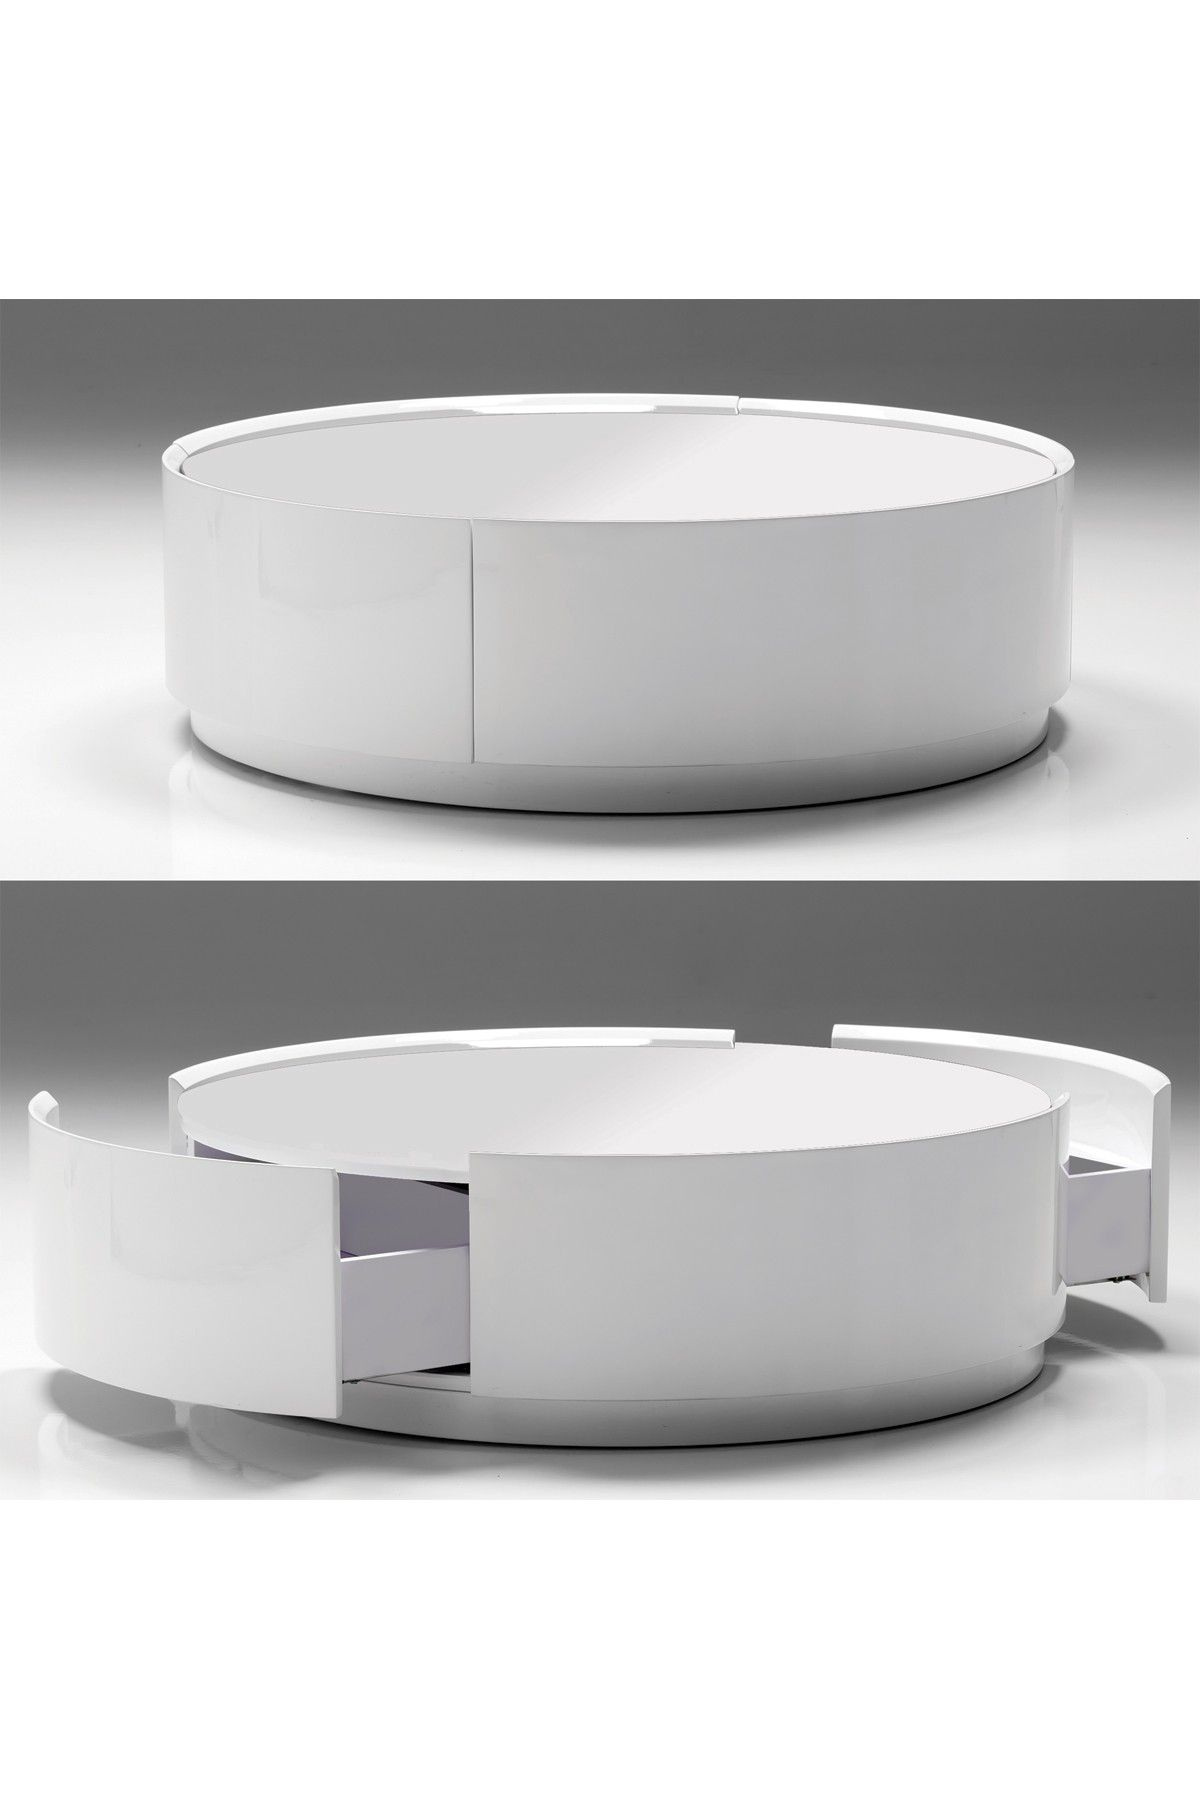 Viva Pure White Storage Coffee Table Hautelook Round Coffee Table Modern Coffee Table With Storage Round Coffee Table